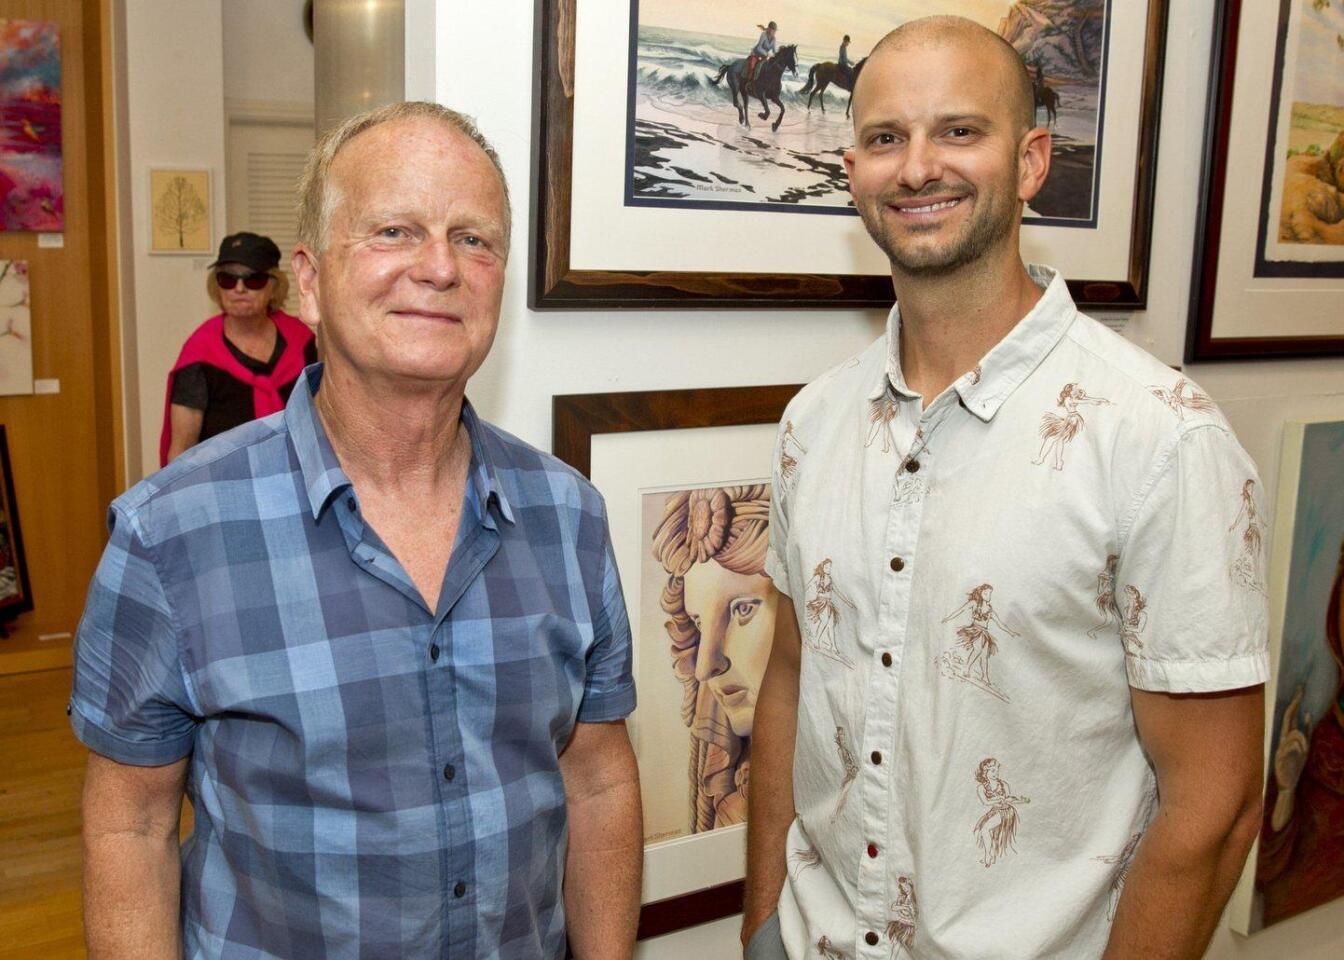 Jay Shrake, Randy Doering